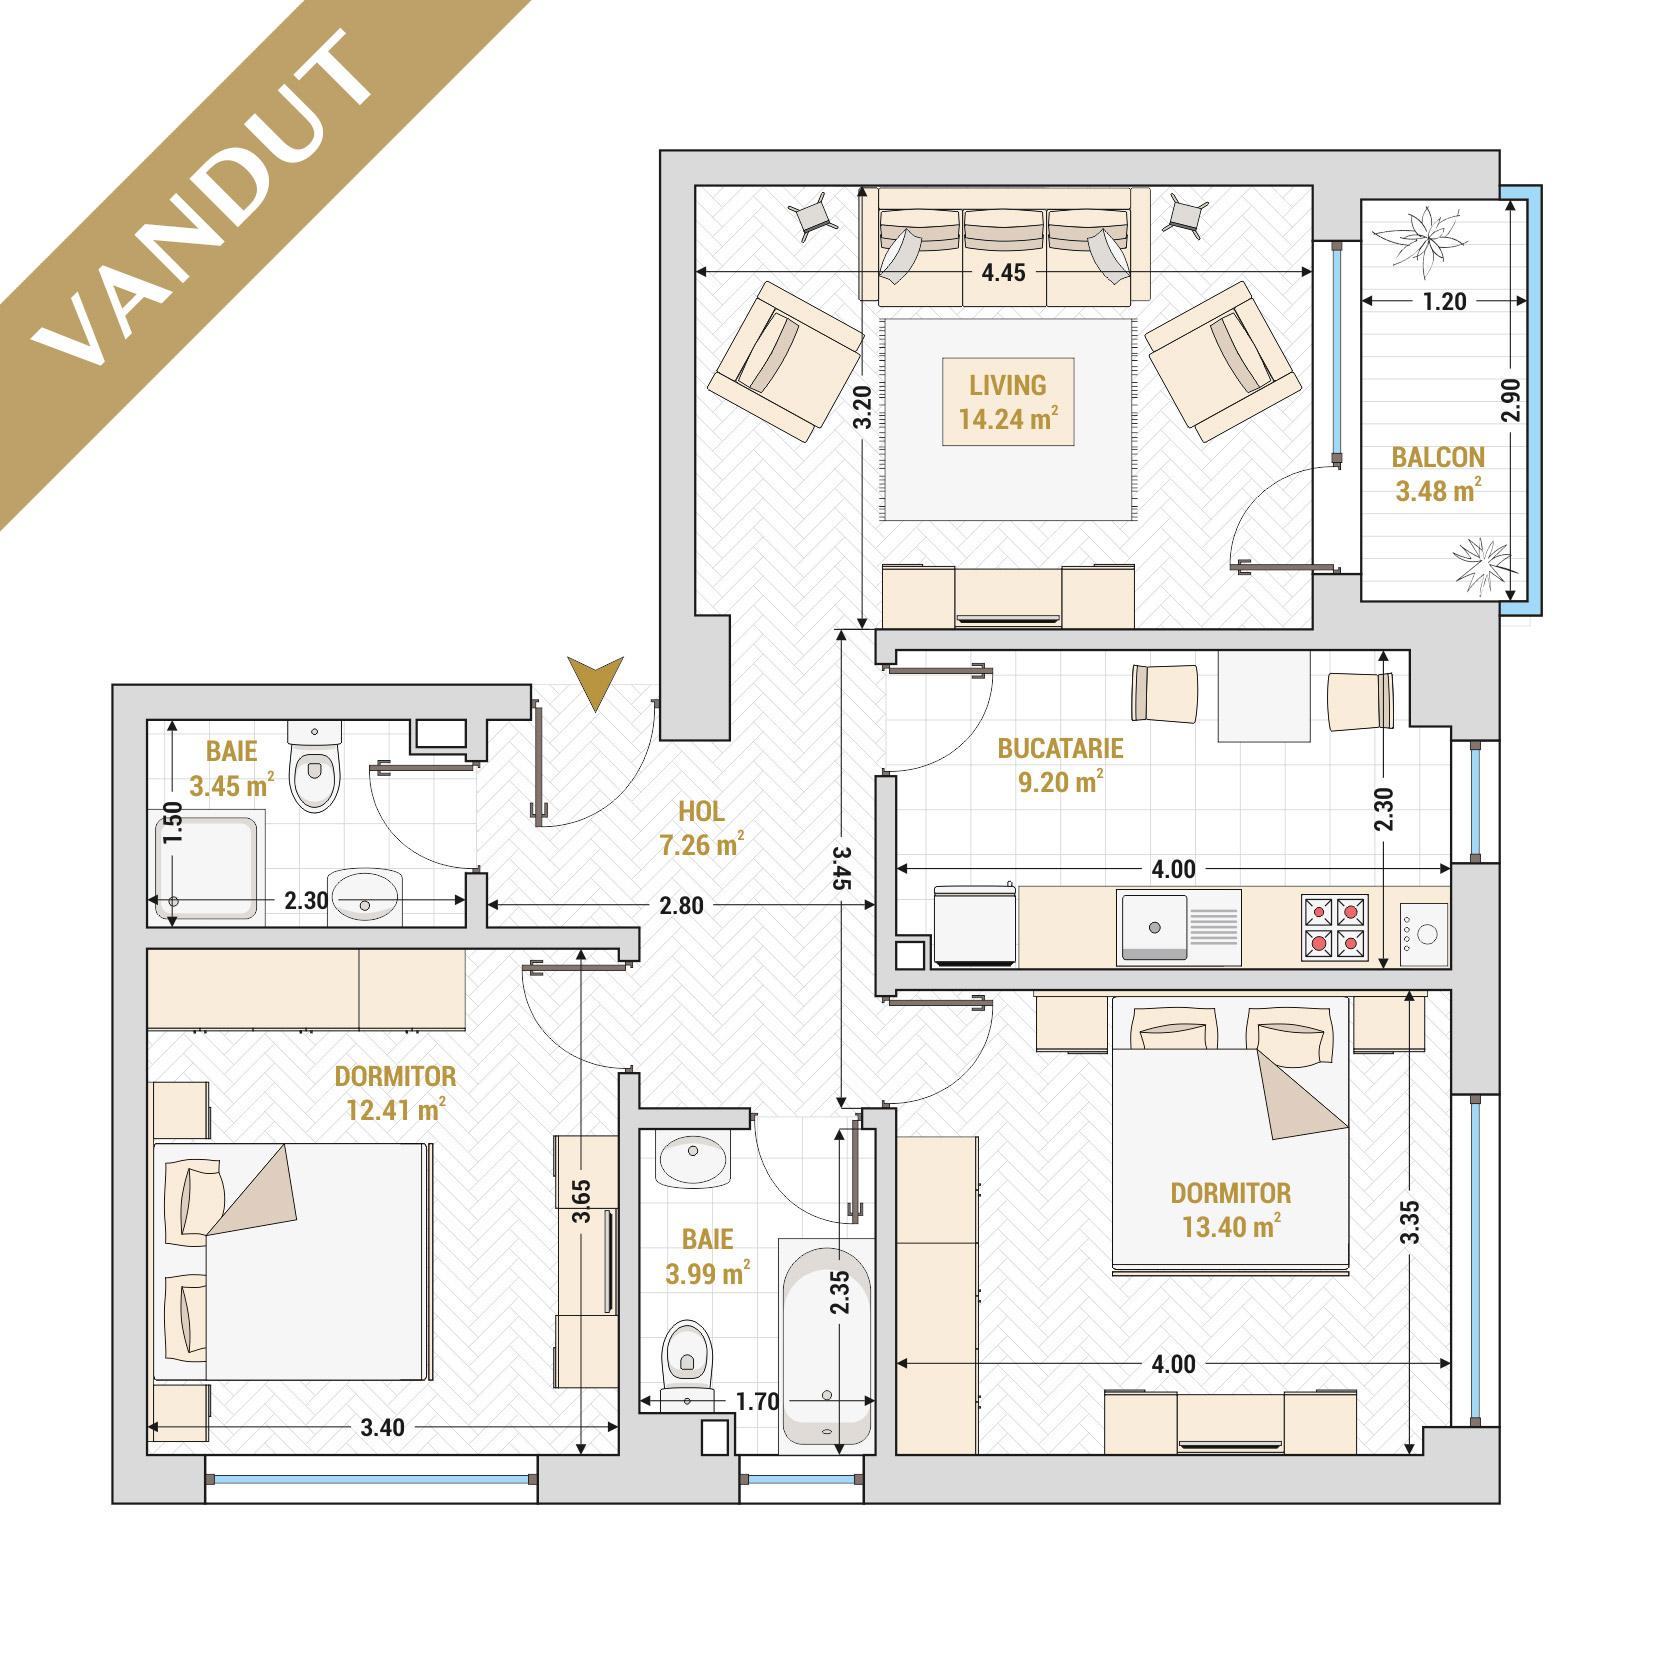 Apartament 3 camere de vanzare Bucuresti - Catedral Residence - Marriott, Piata Unirii, 13 Septembrie, Izvor - Tip 1 - T2